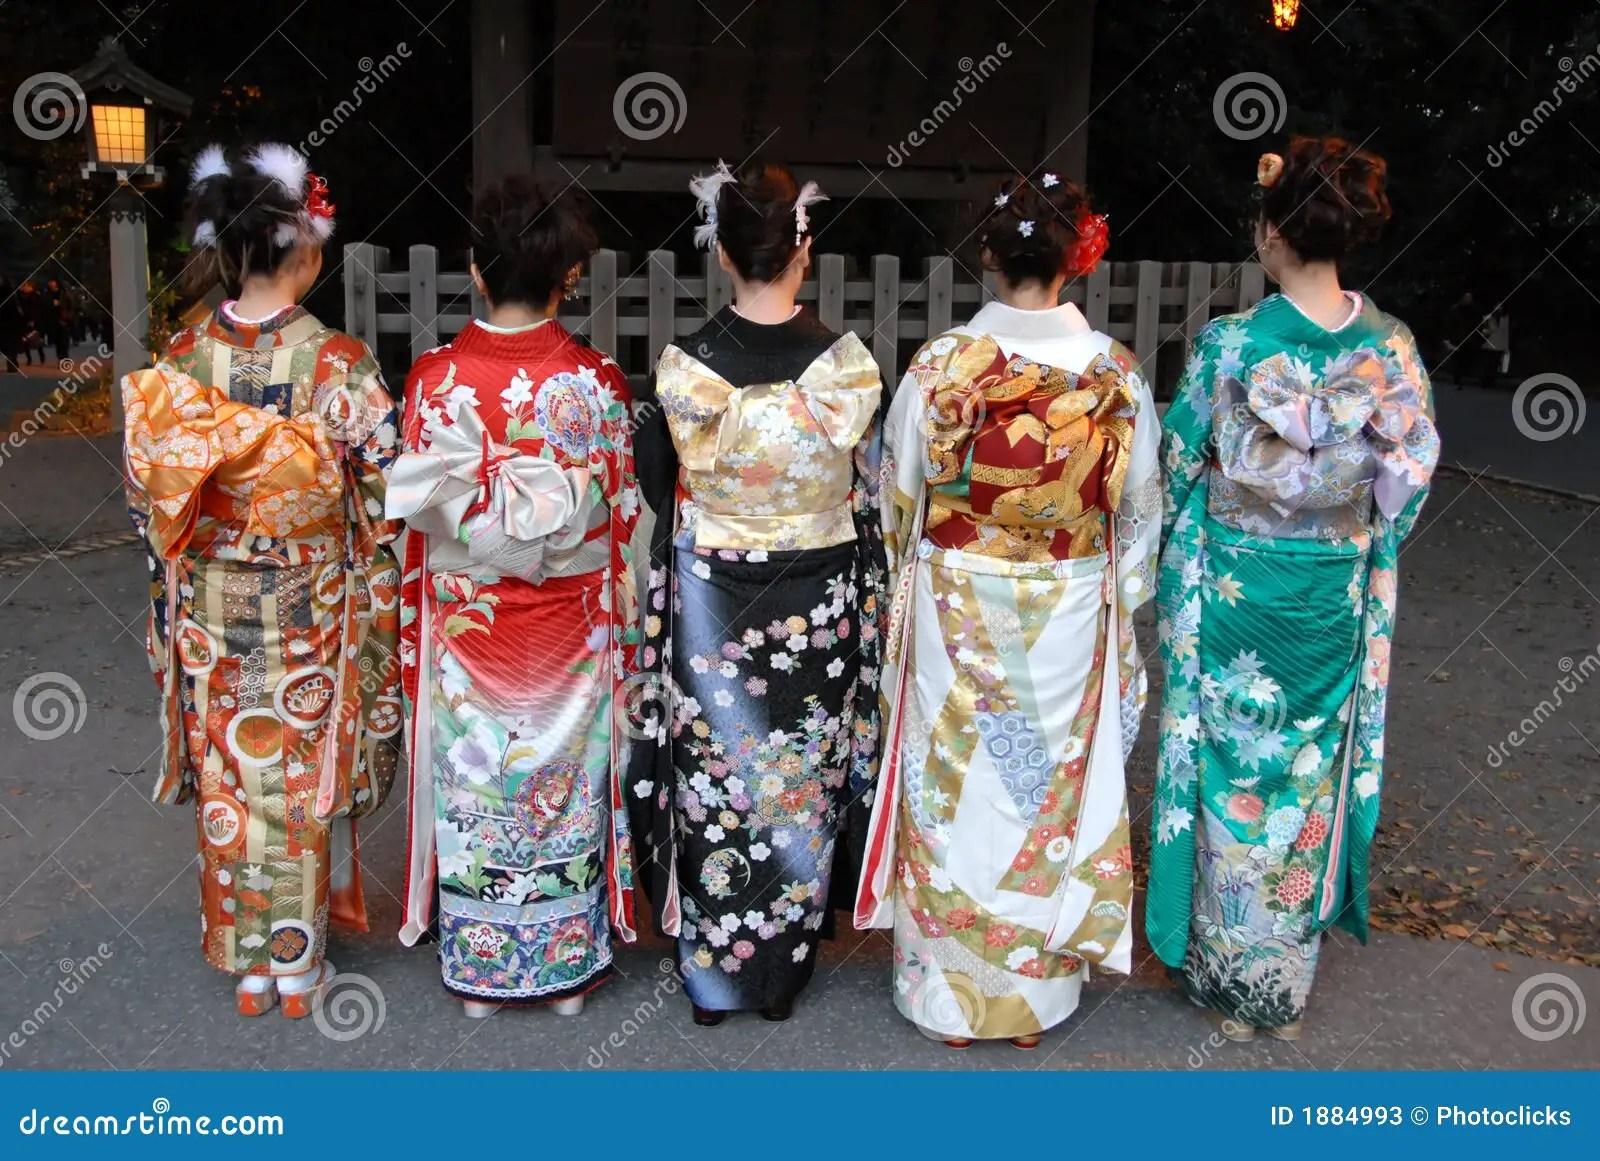 Young Women In Kimono Dress Stock Image